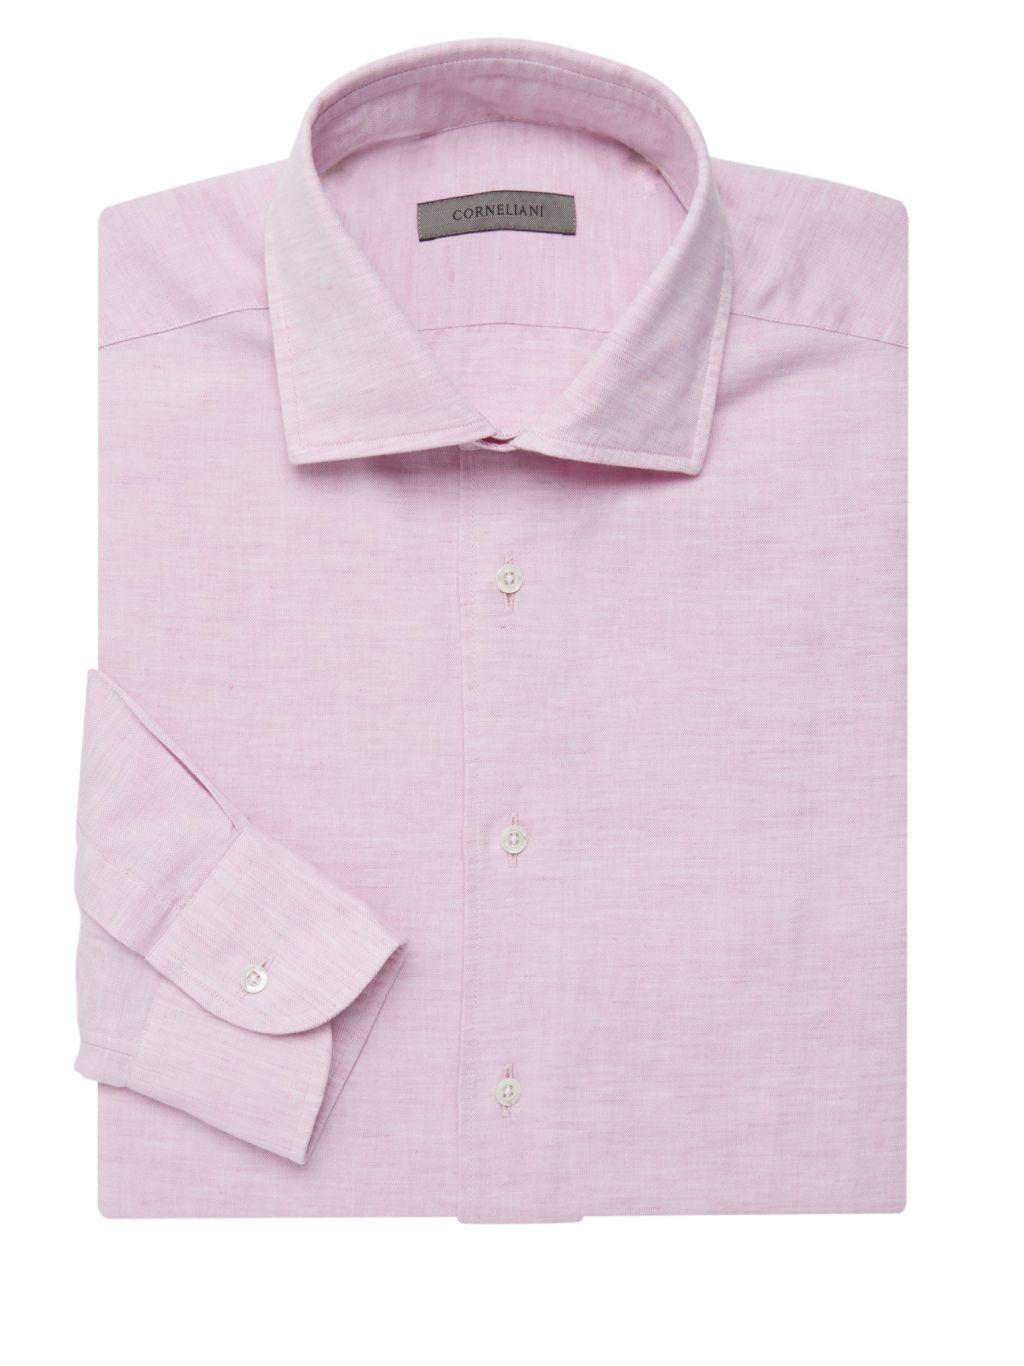 Corneliani Cotton & Linen Dress Shirt